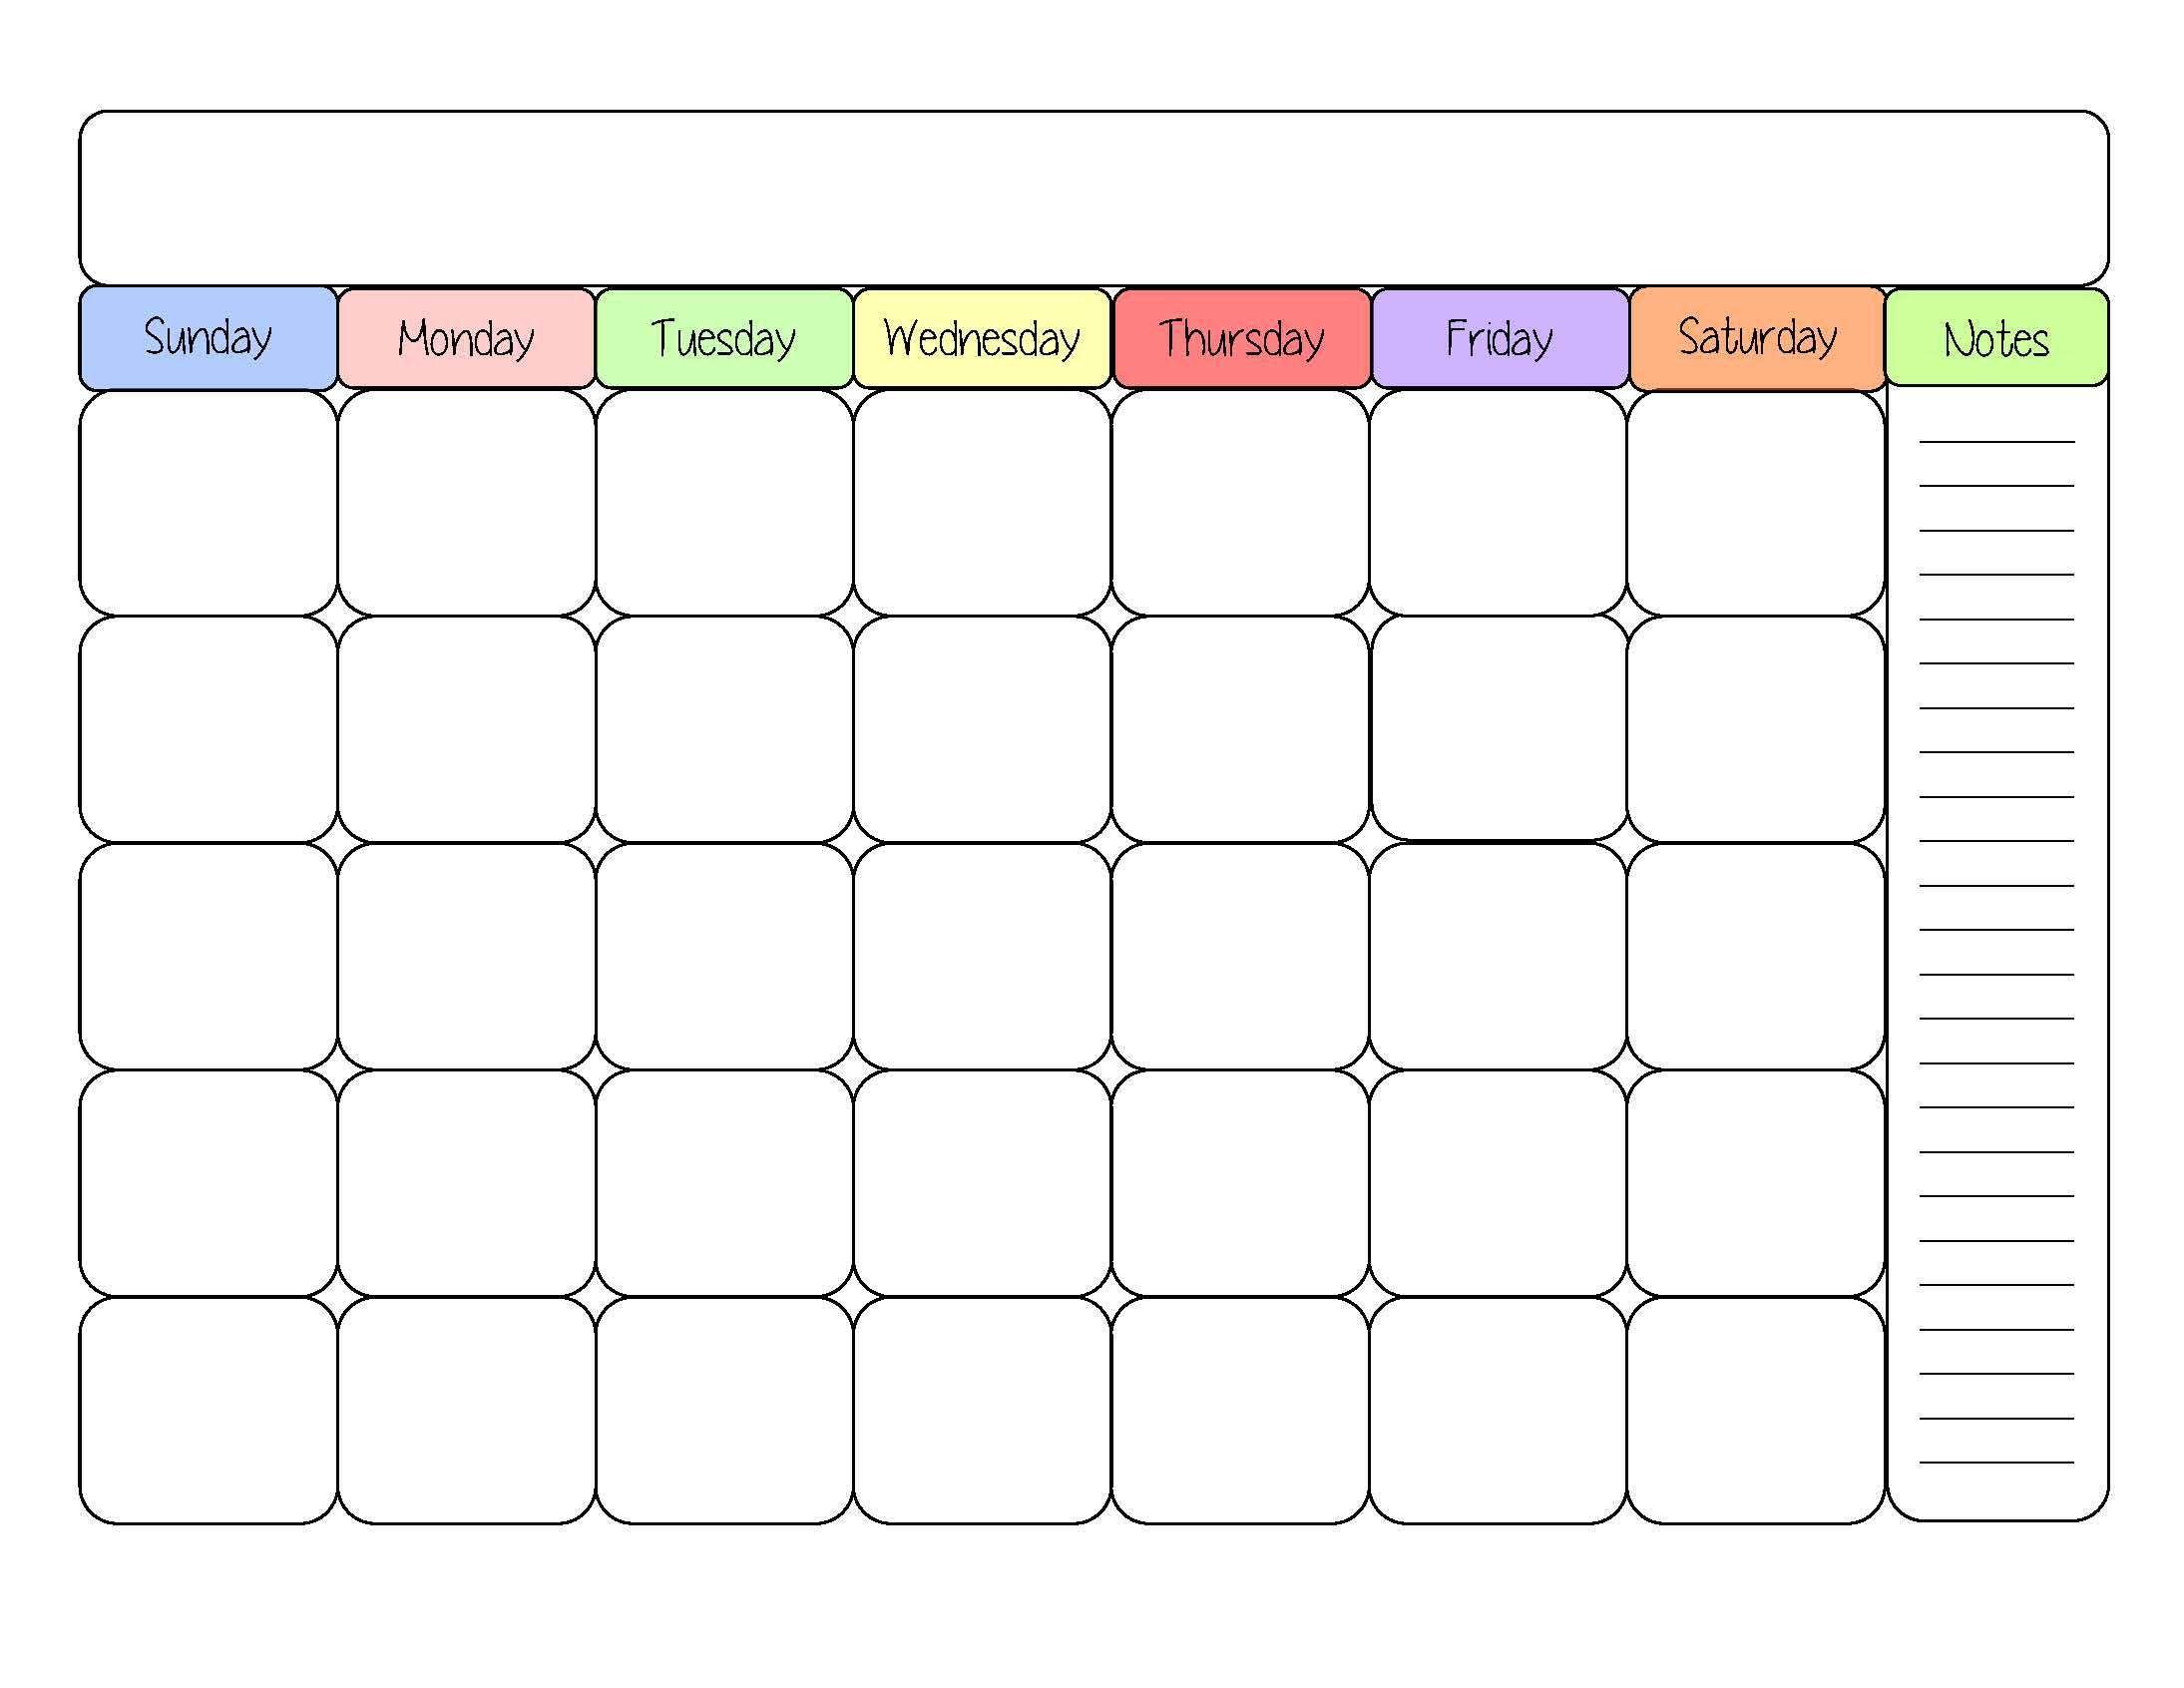 cute-blank-calendar-templates | Good ideas | Pinterest